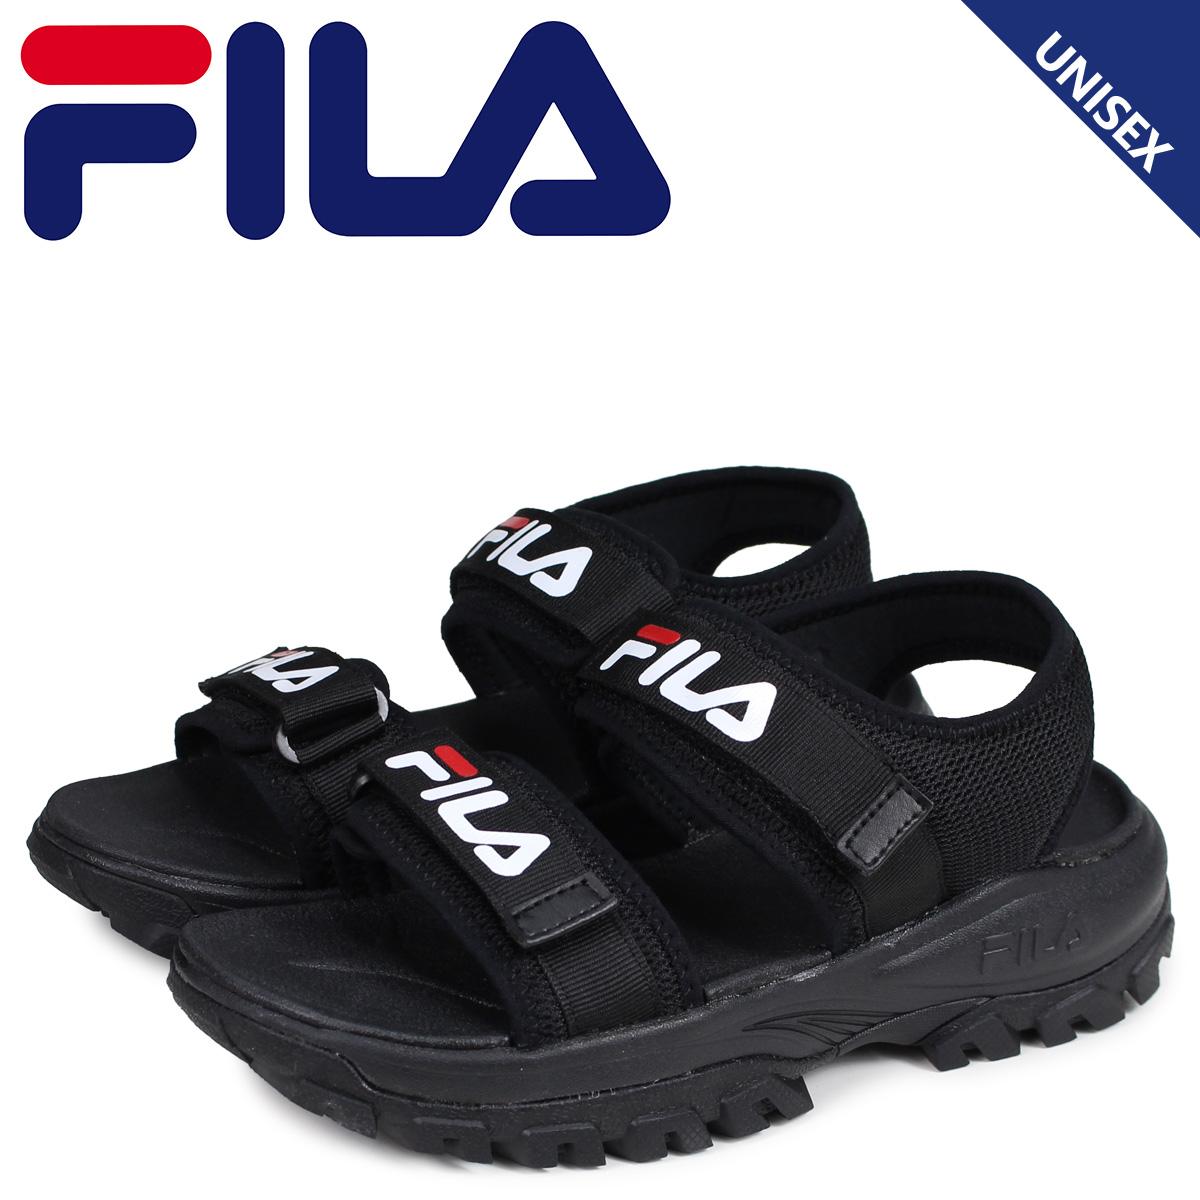 2f89bc6b Fila FILA tracer sandals sports sandals men gap Dis thickness bottom RAY  TRACER SD black black FS1SIB2011X-BBK